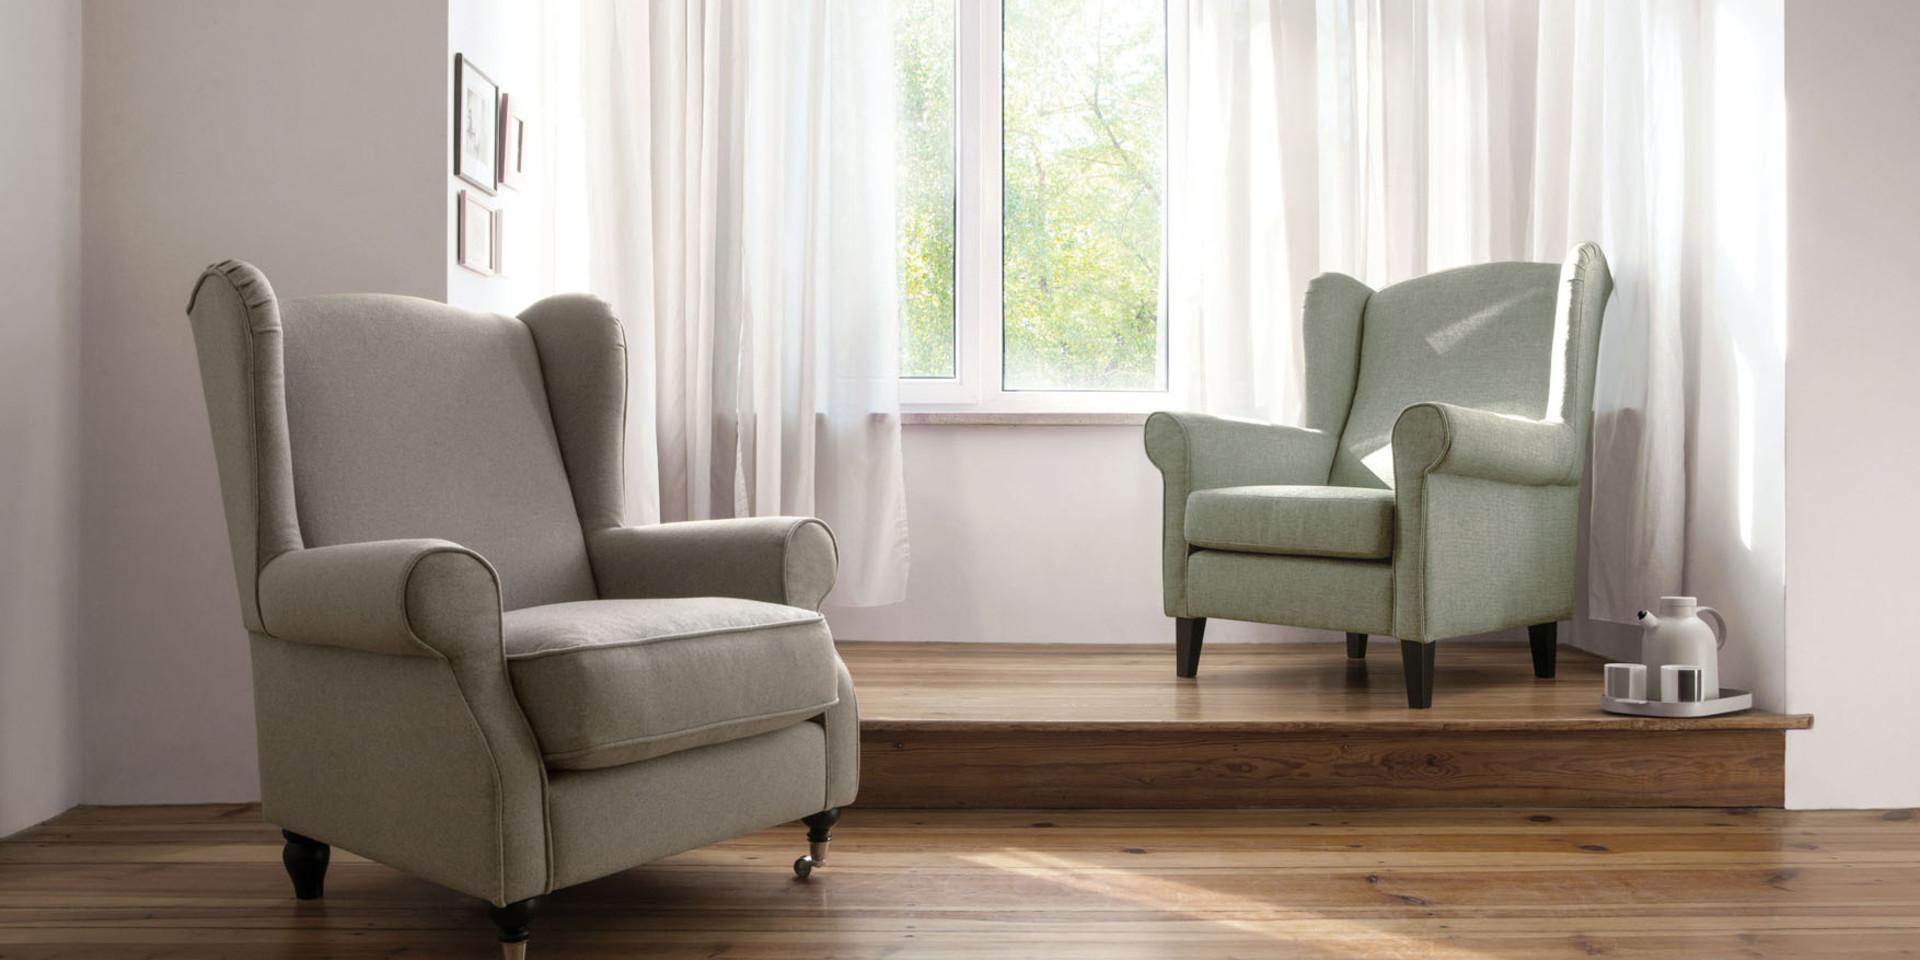 sits-humphrey-ambiance-humphrey_armchair_high_panno1000_light_grey_watson_armchair_himalaya7_green_3